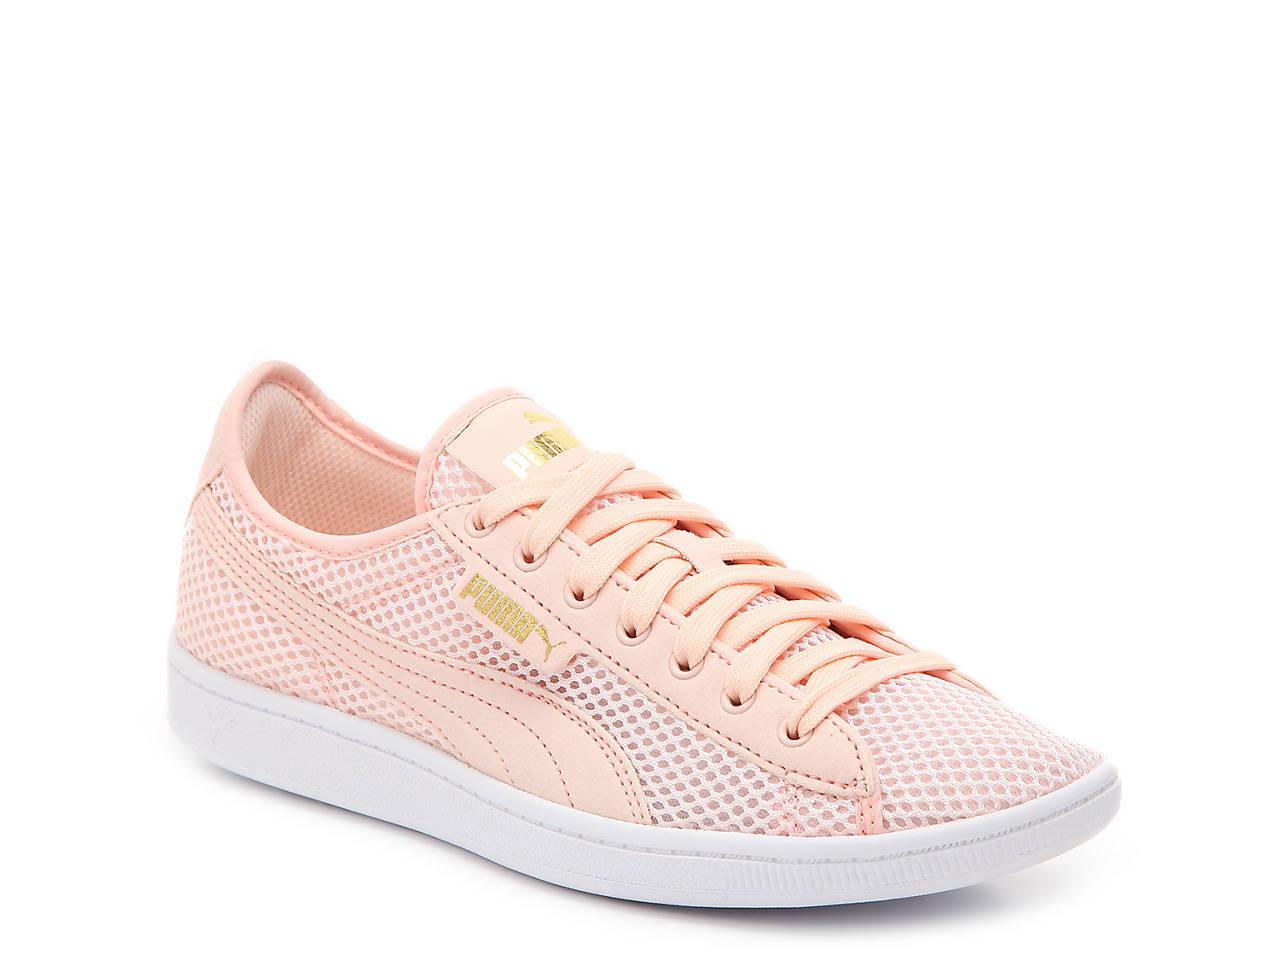 1e7bea095221 Puma Vikky Mesh Sneaker - Women s Women s Shoes